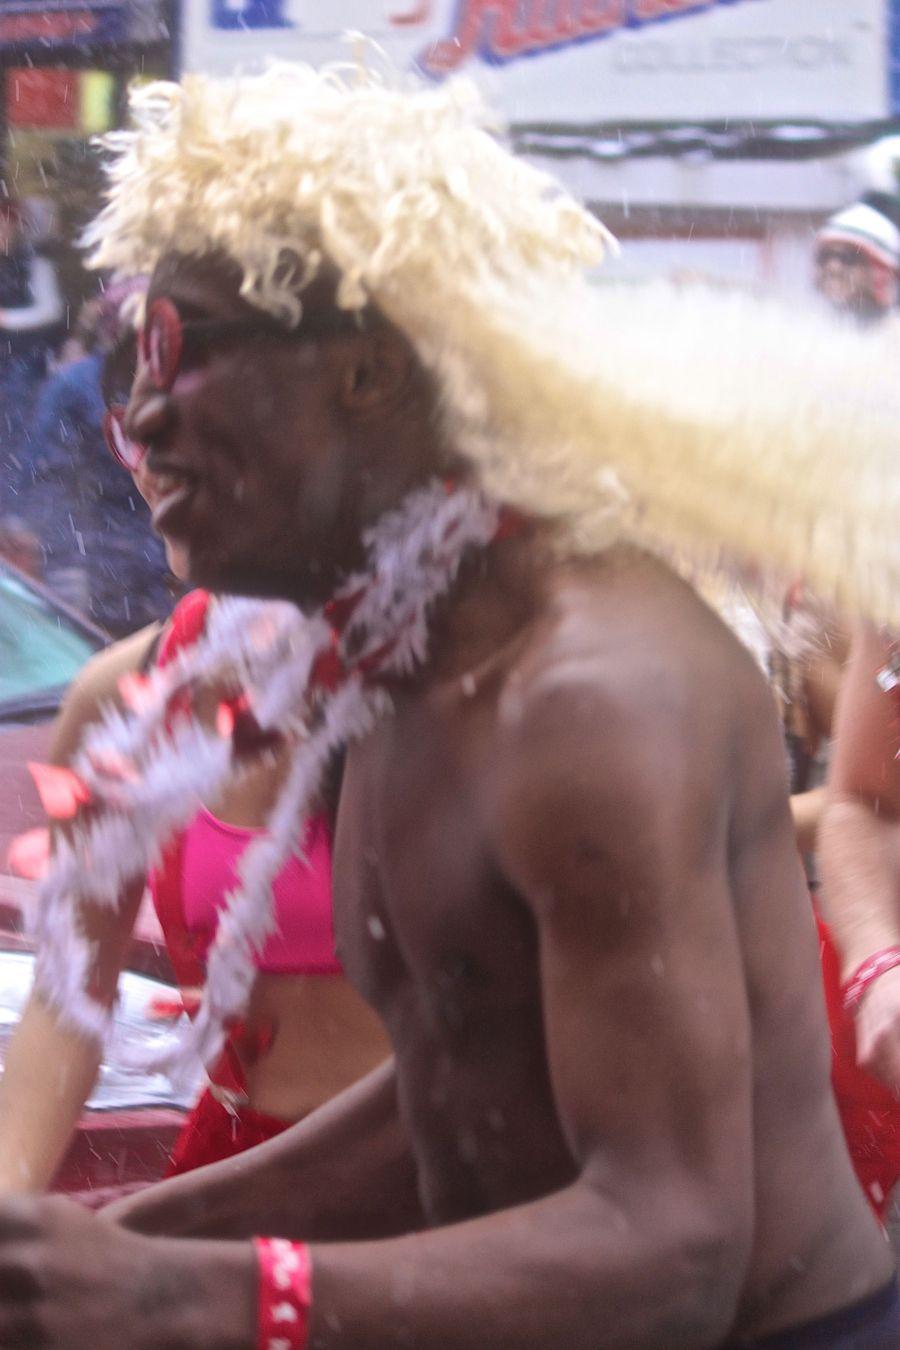 boston cupid undies run february 15 blond wig